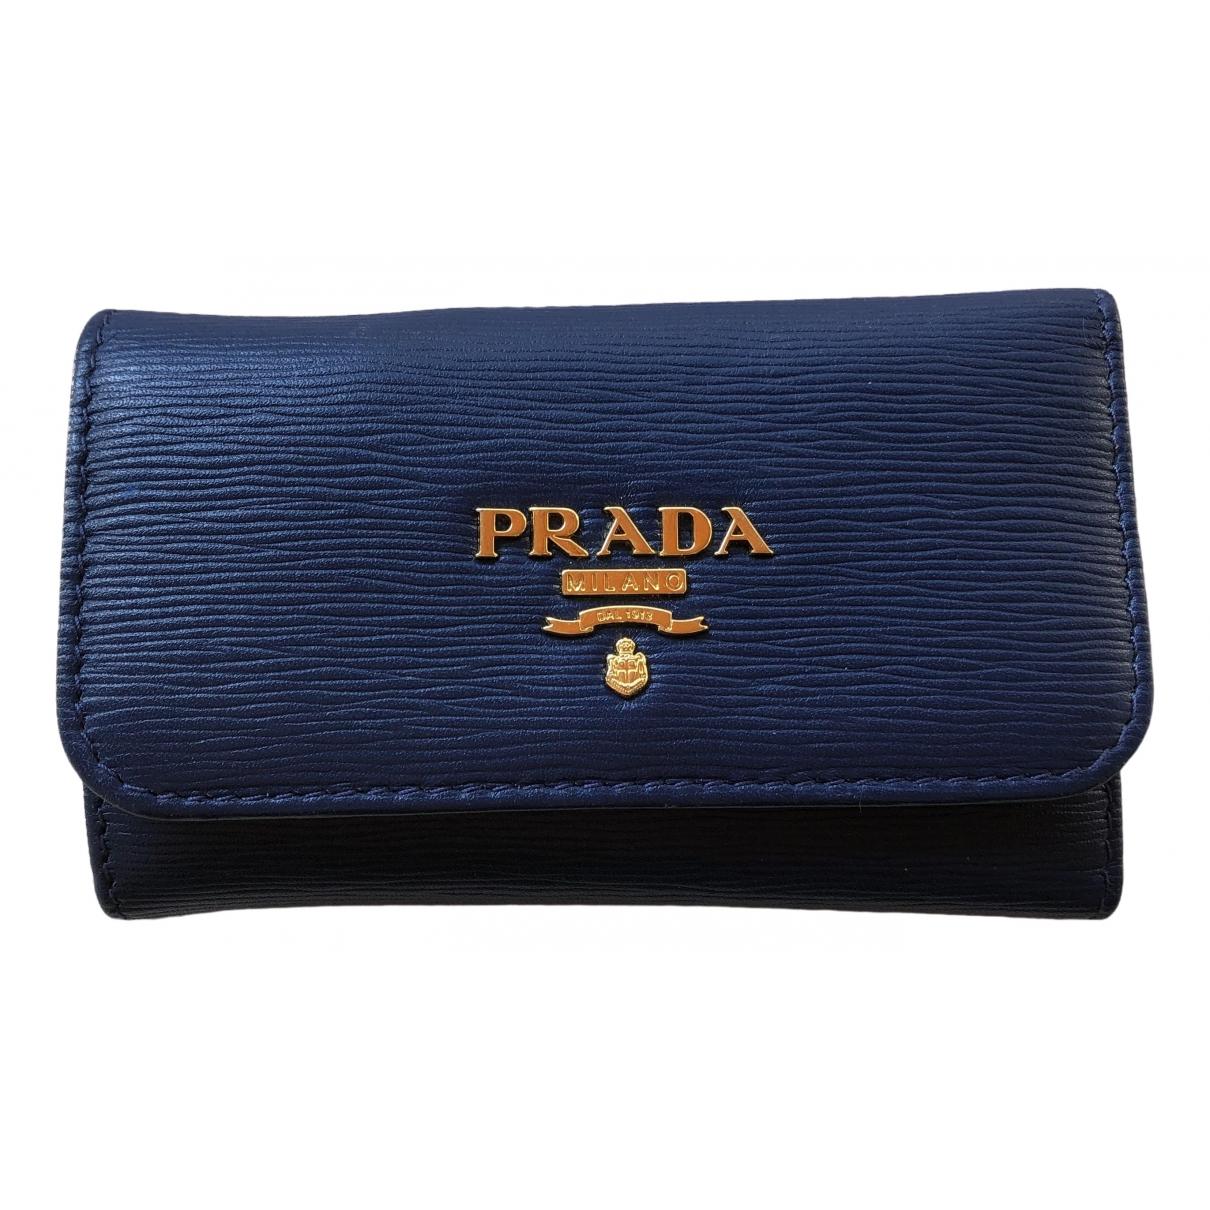 Prada - Petite maroquinerie   pour femme en cuir - bleu